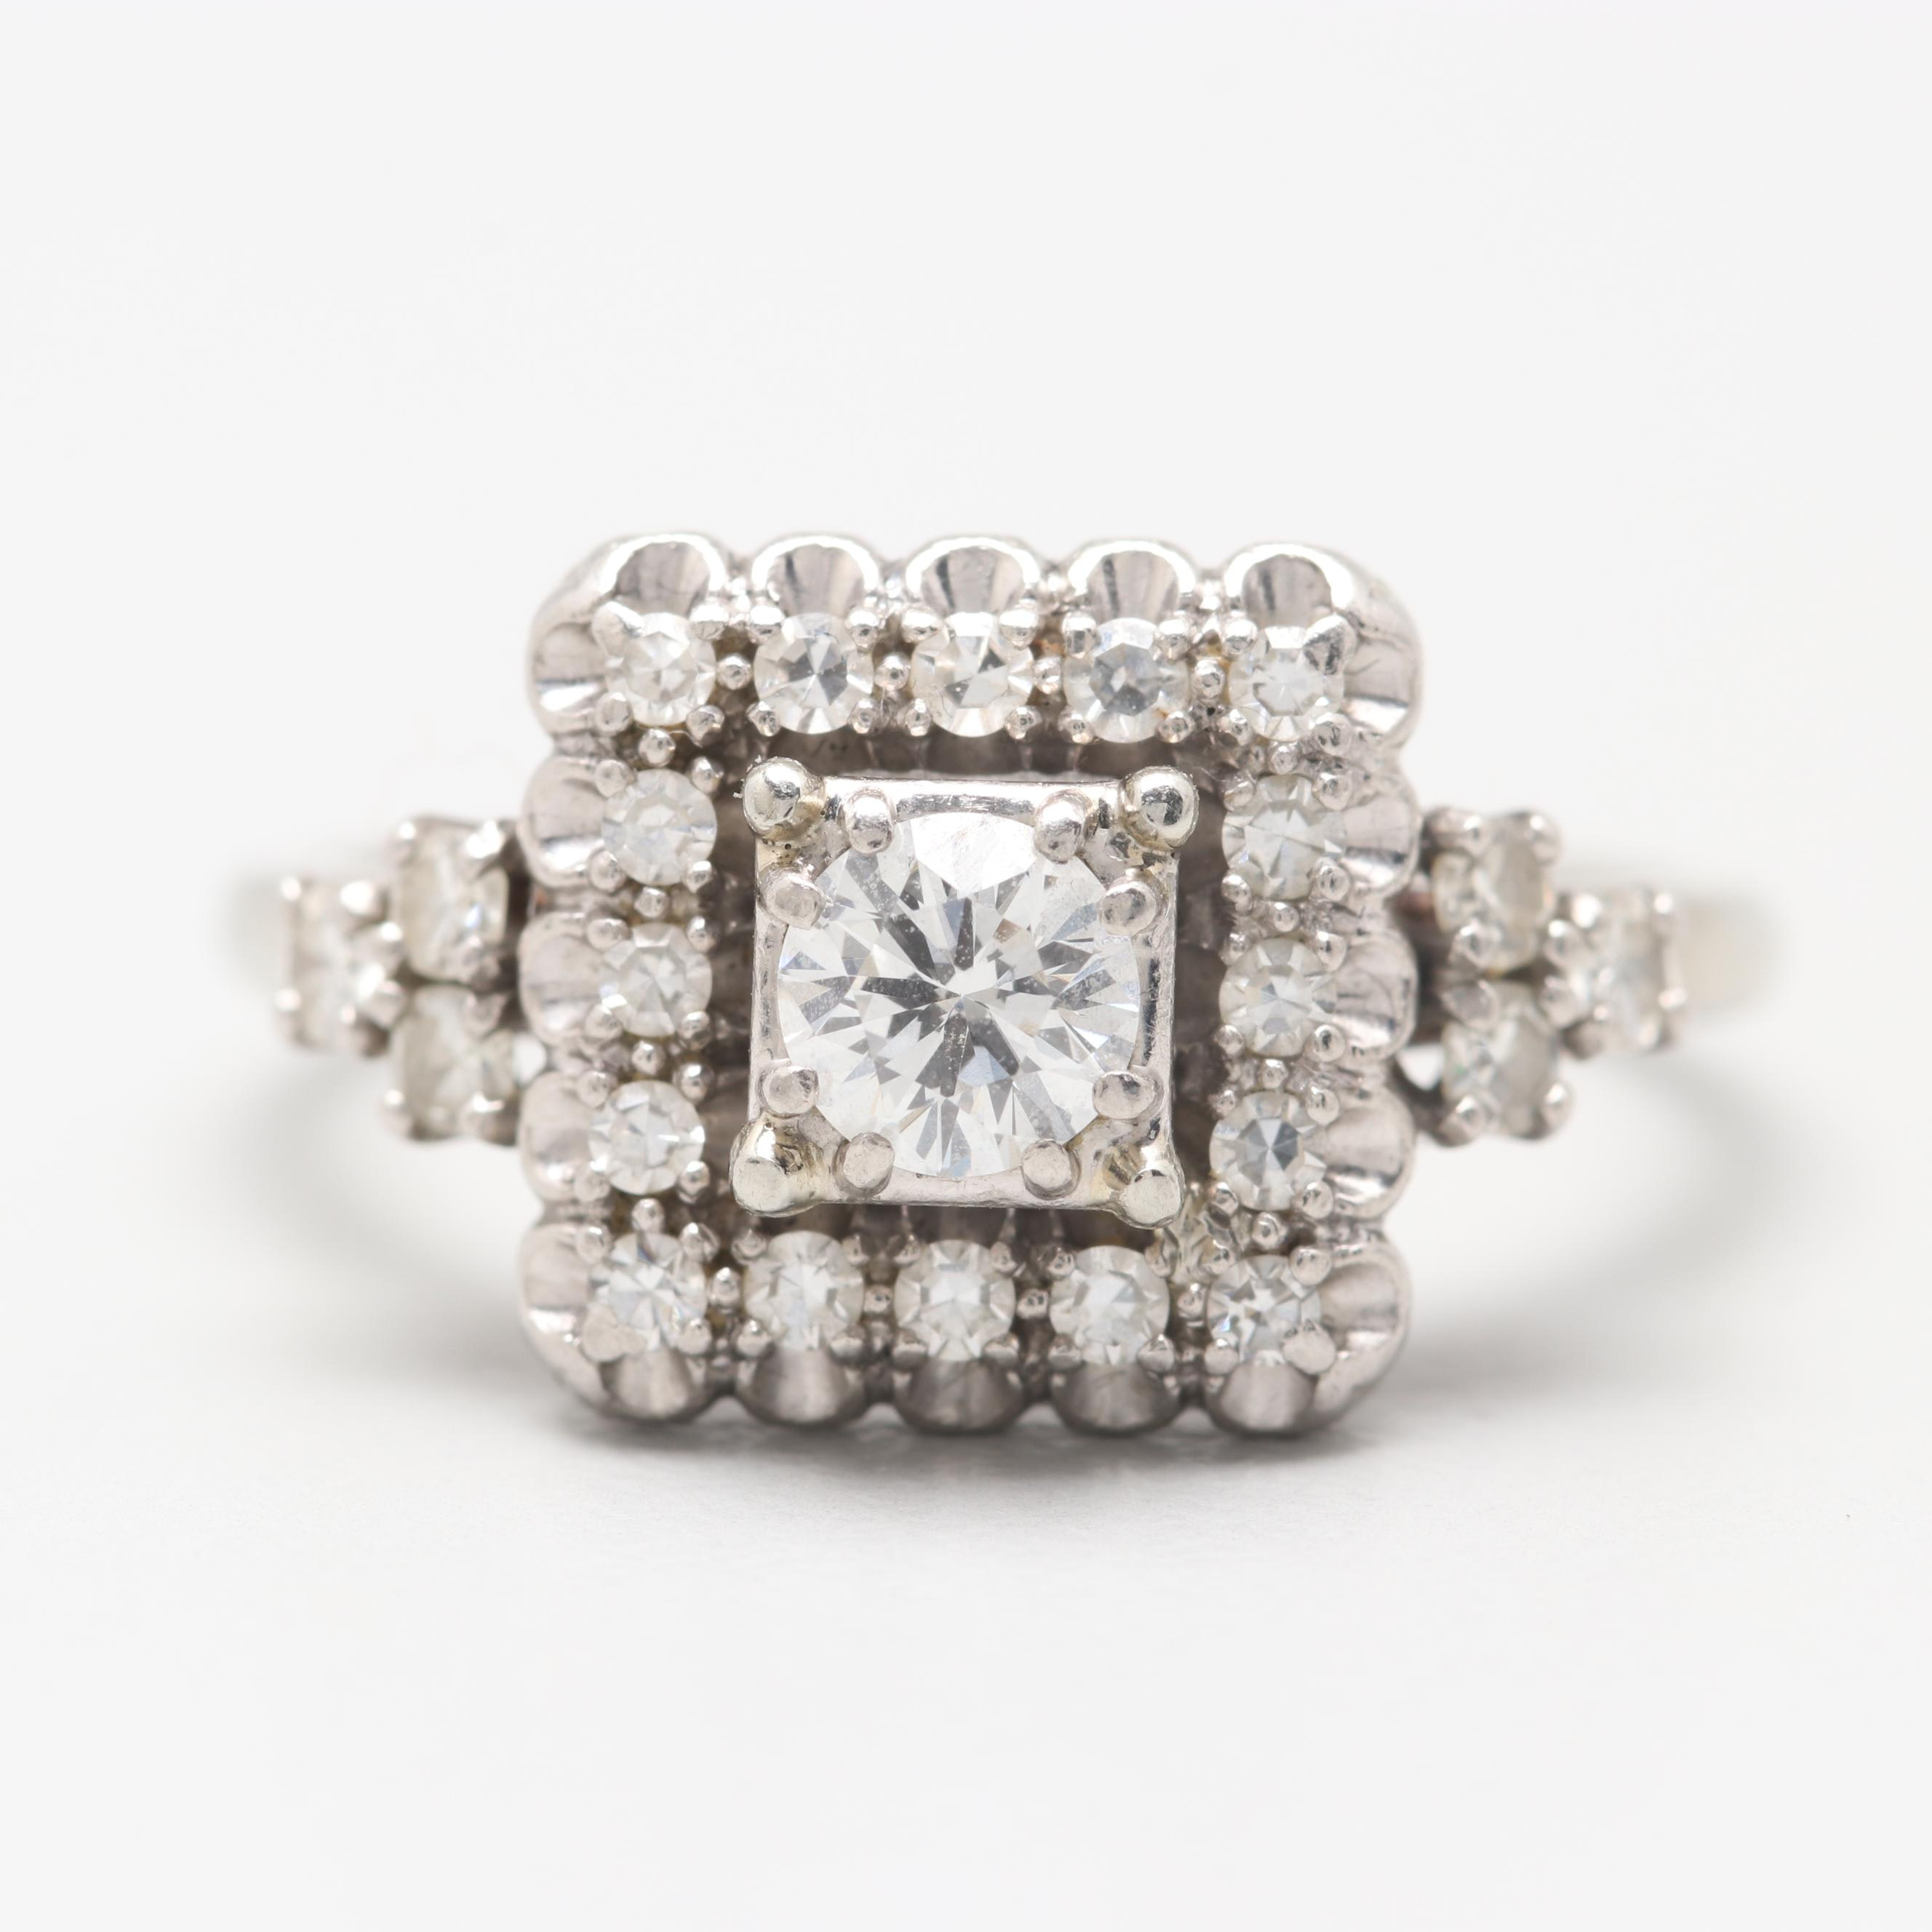 Jabel 18K White Gold Diamond Ring with Palladium Accent